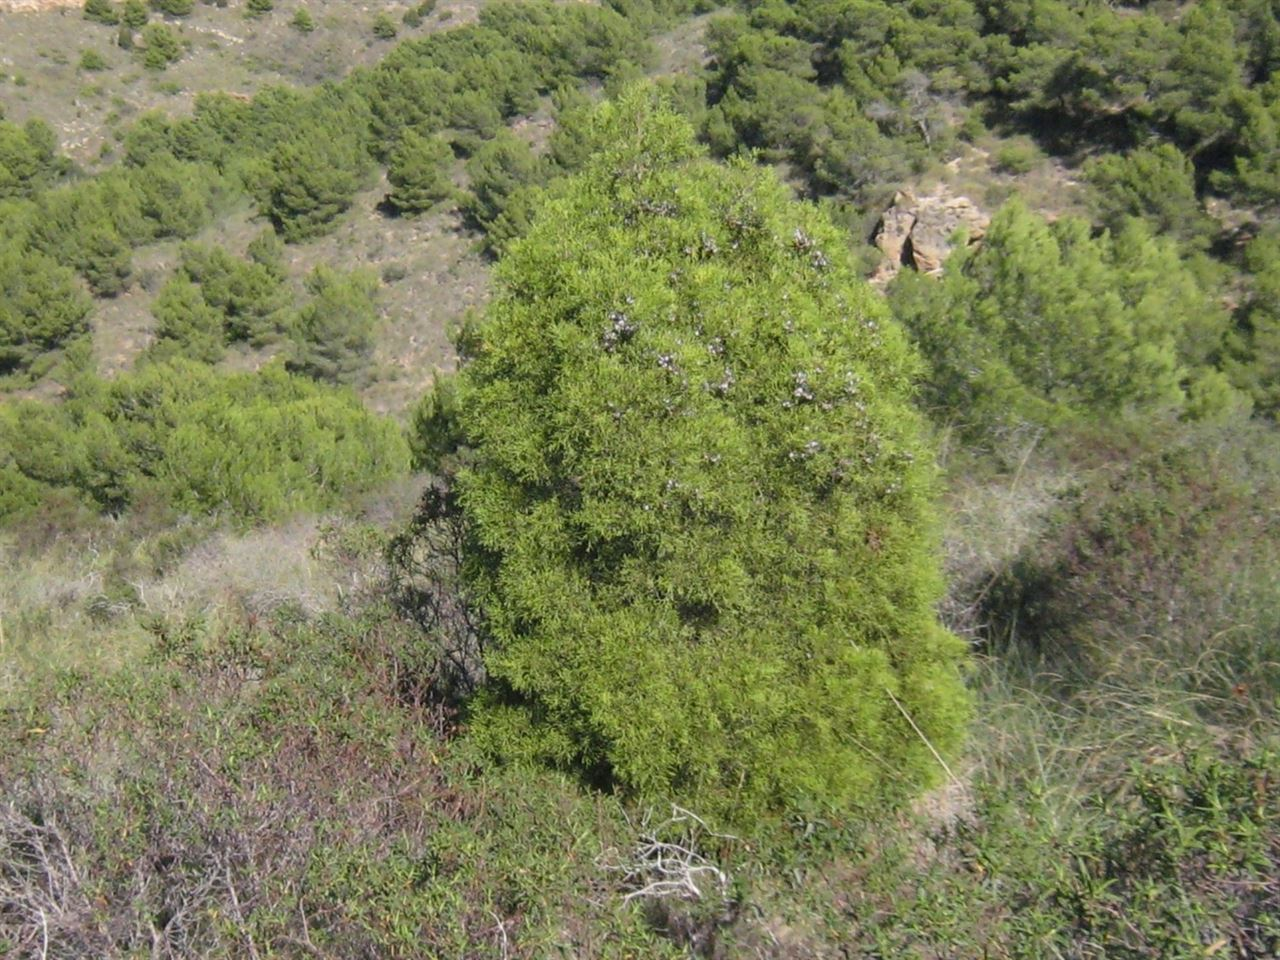 Proyecto LIFE europeo para conservar los bosques de ciprés de Cartagena